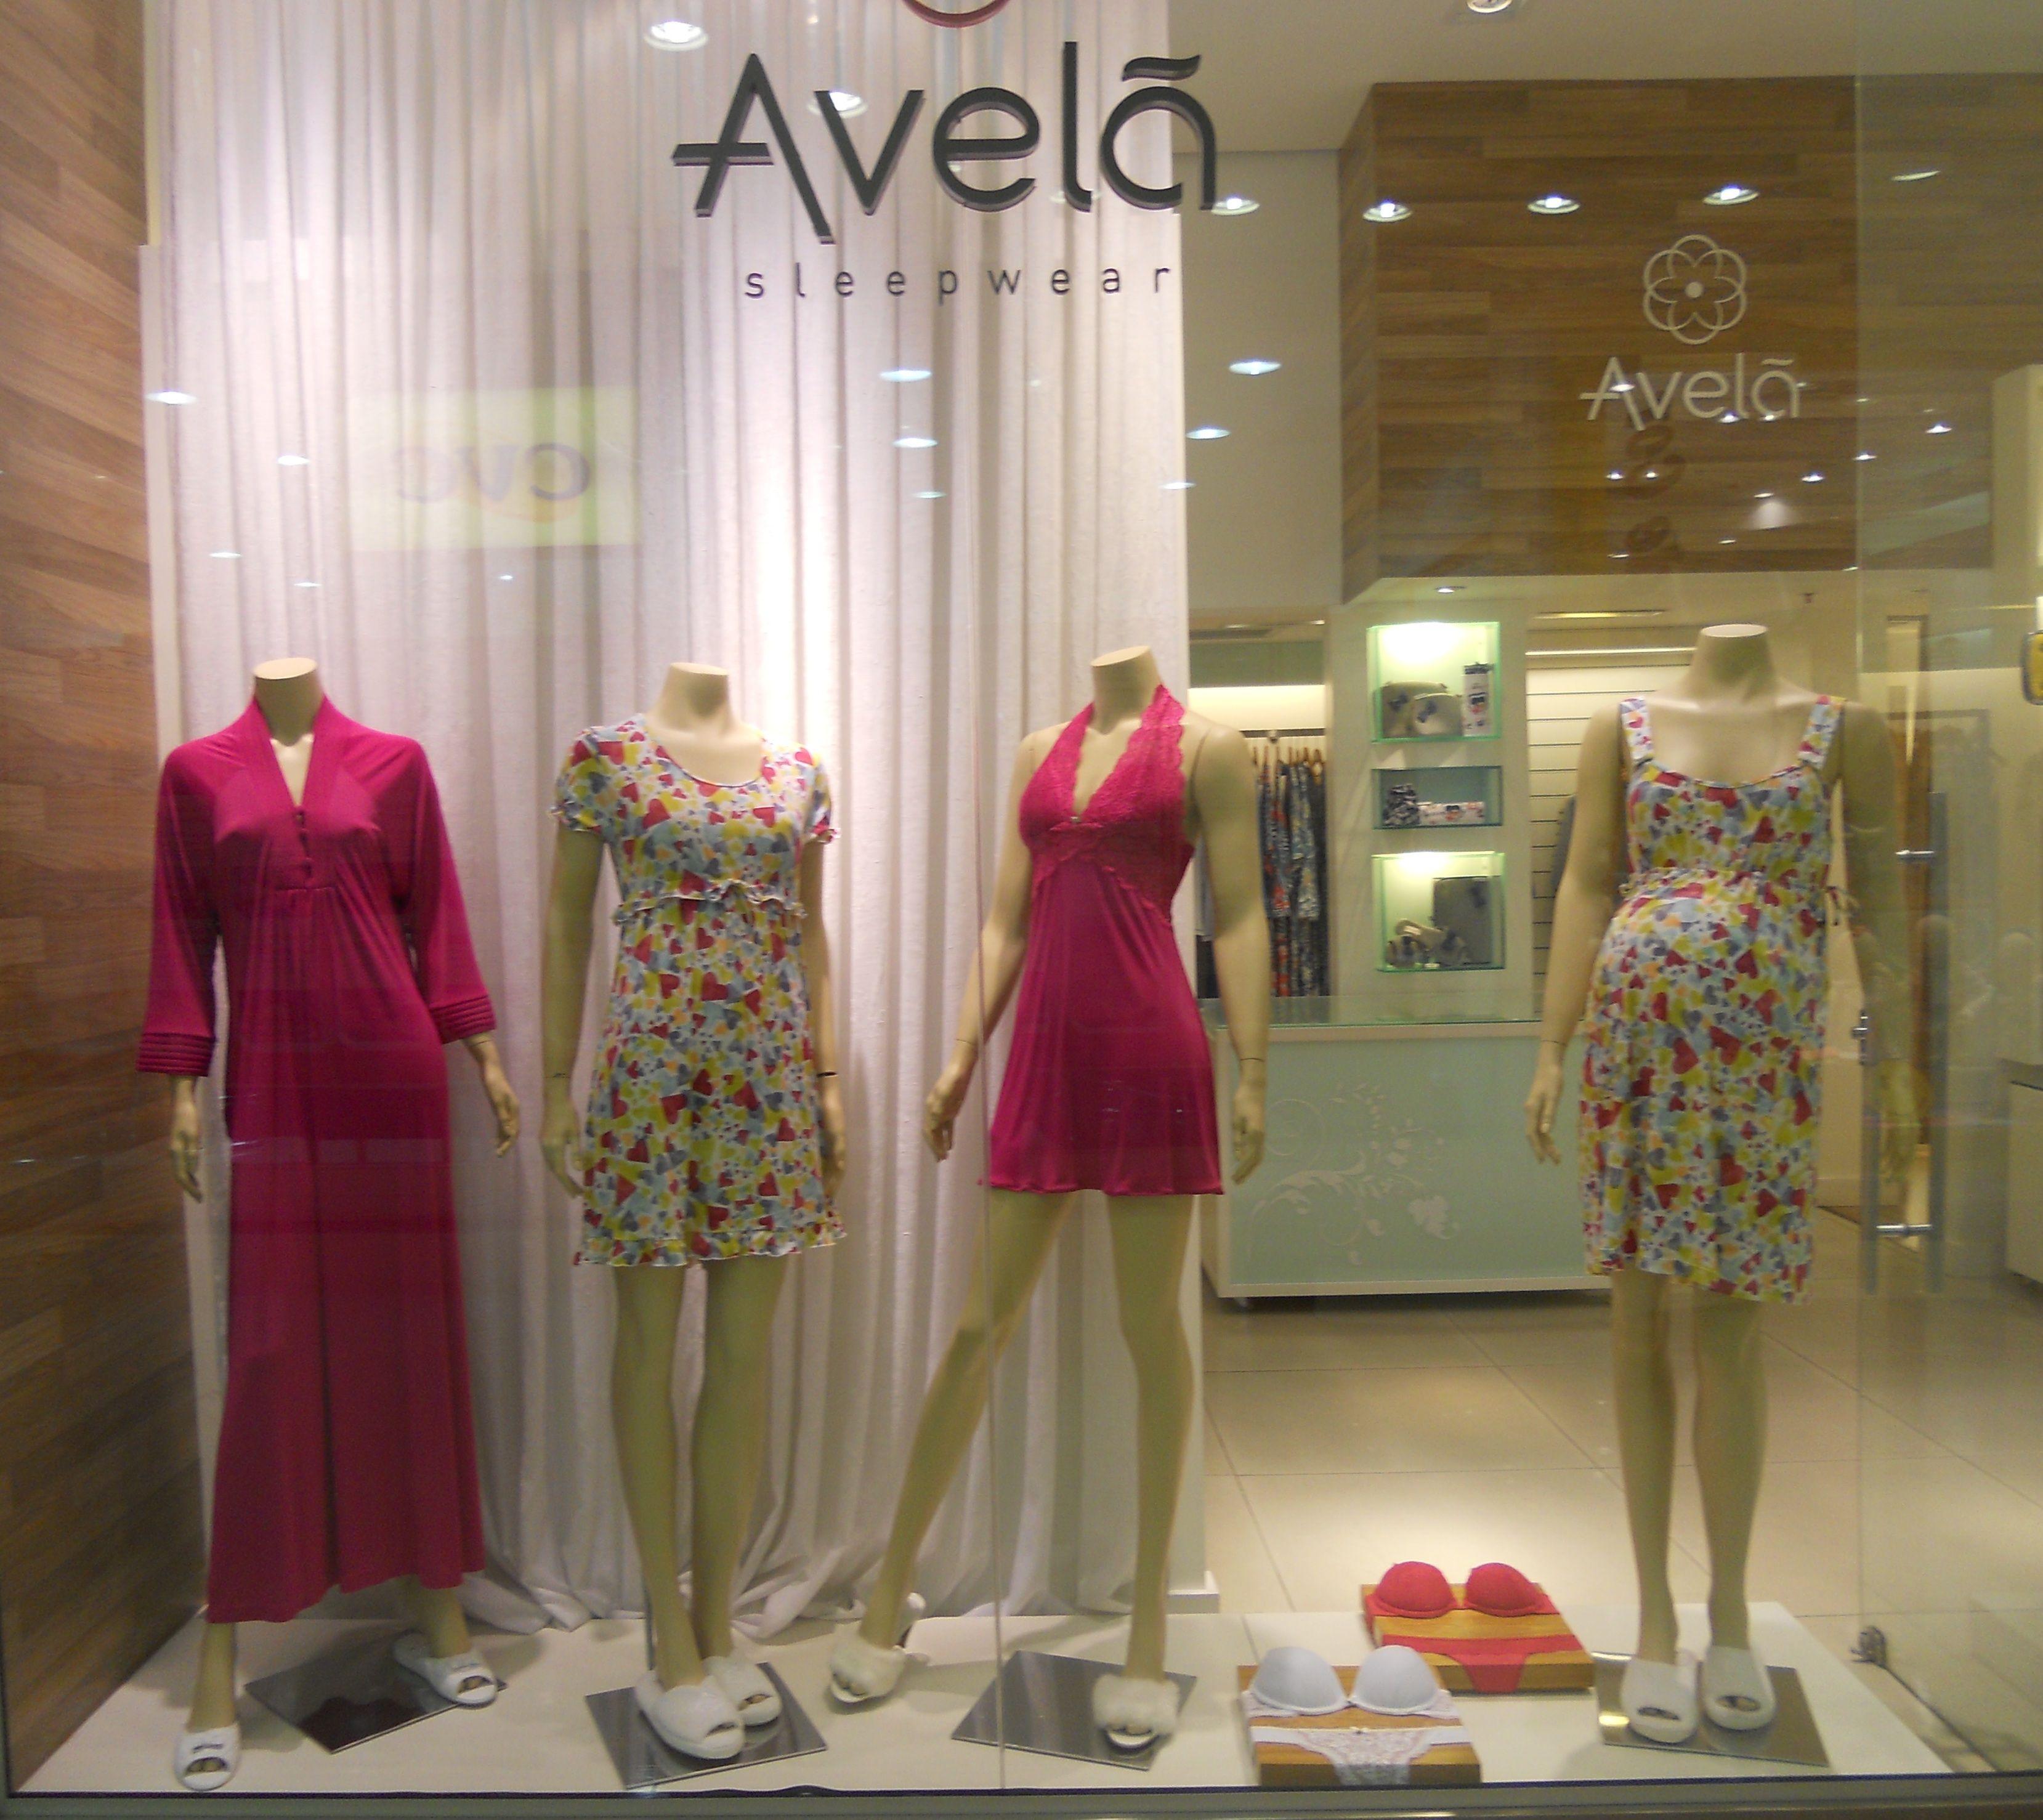 Vitrine da Semana da Avelã - 22 agosto 2012 - #pink #primavera #verao